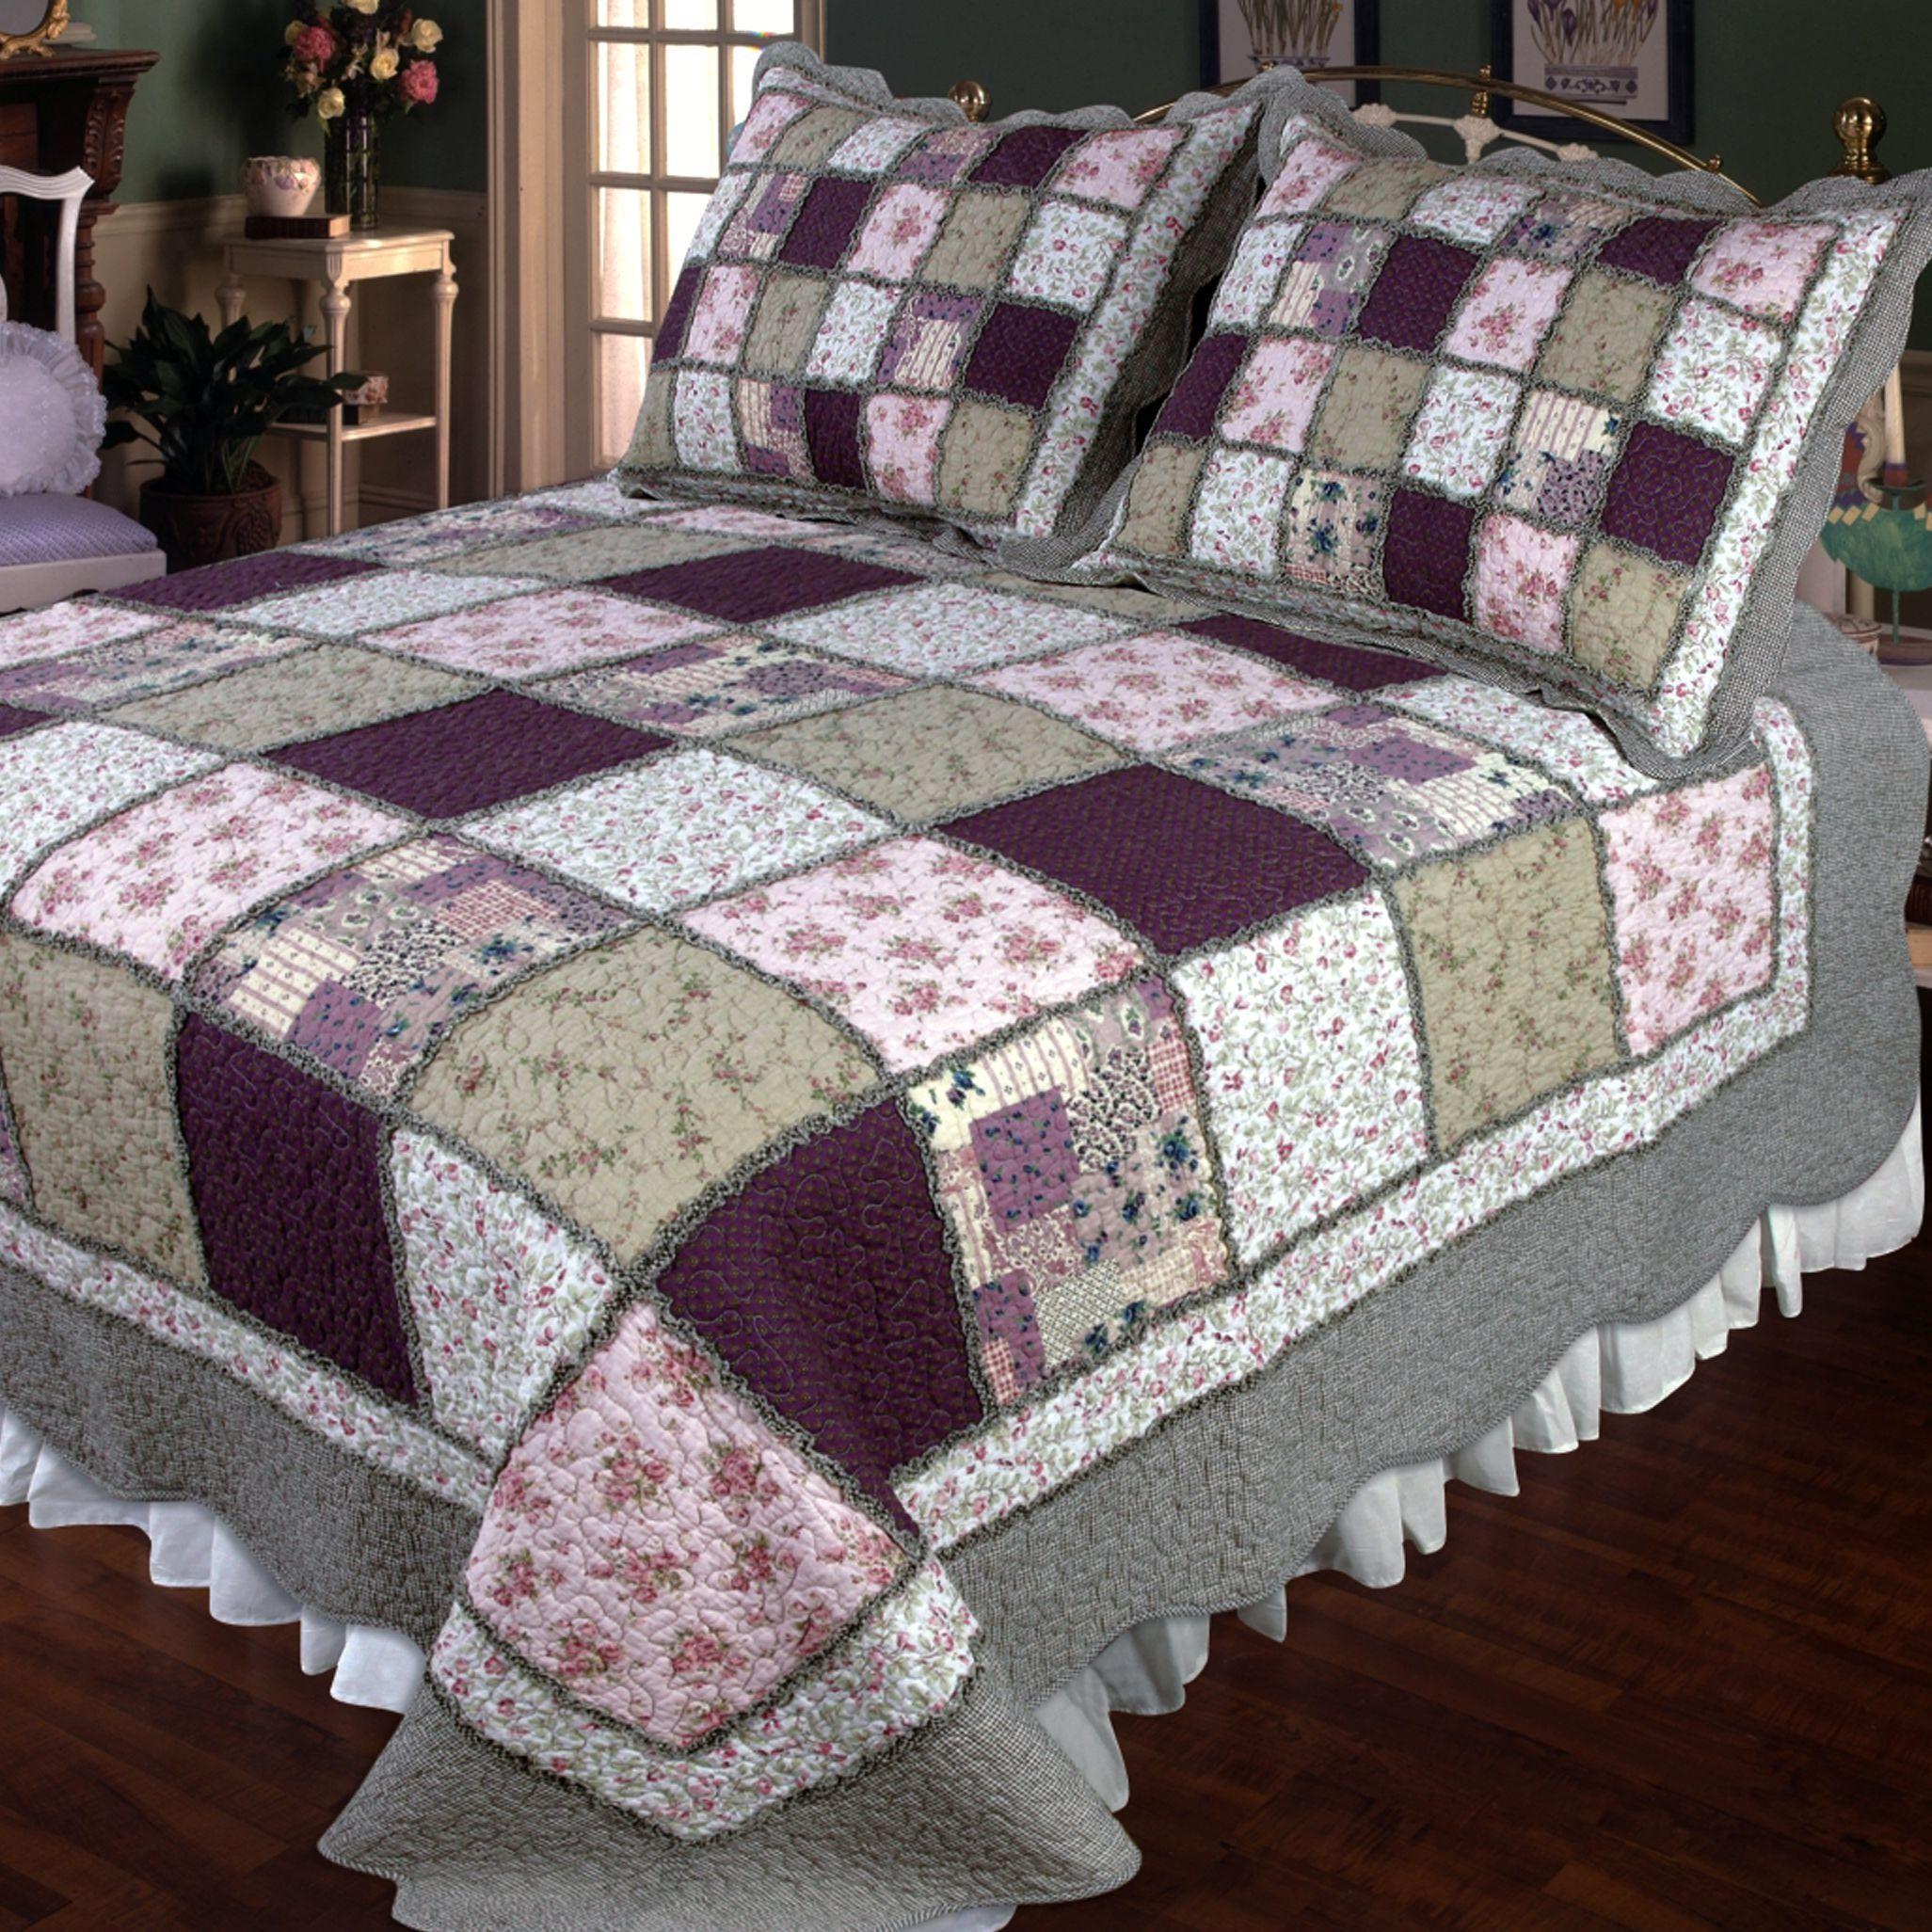 Features: -Sugar Plum collection. -Material: Cotton fabrics ... : quilt filling material - Adamdwight.com